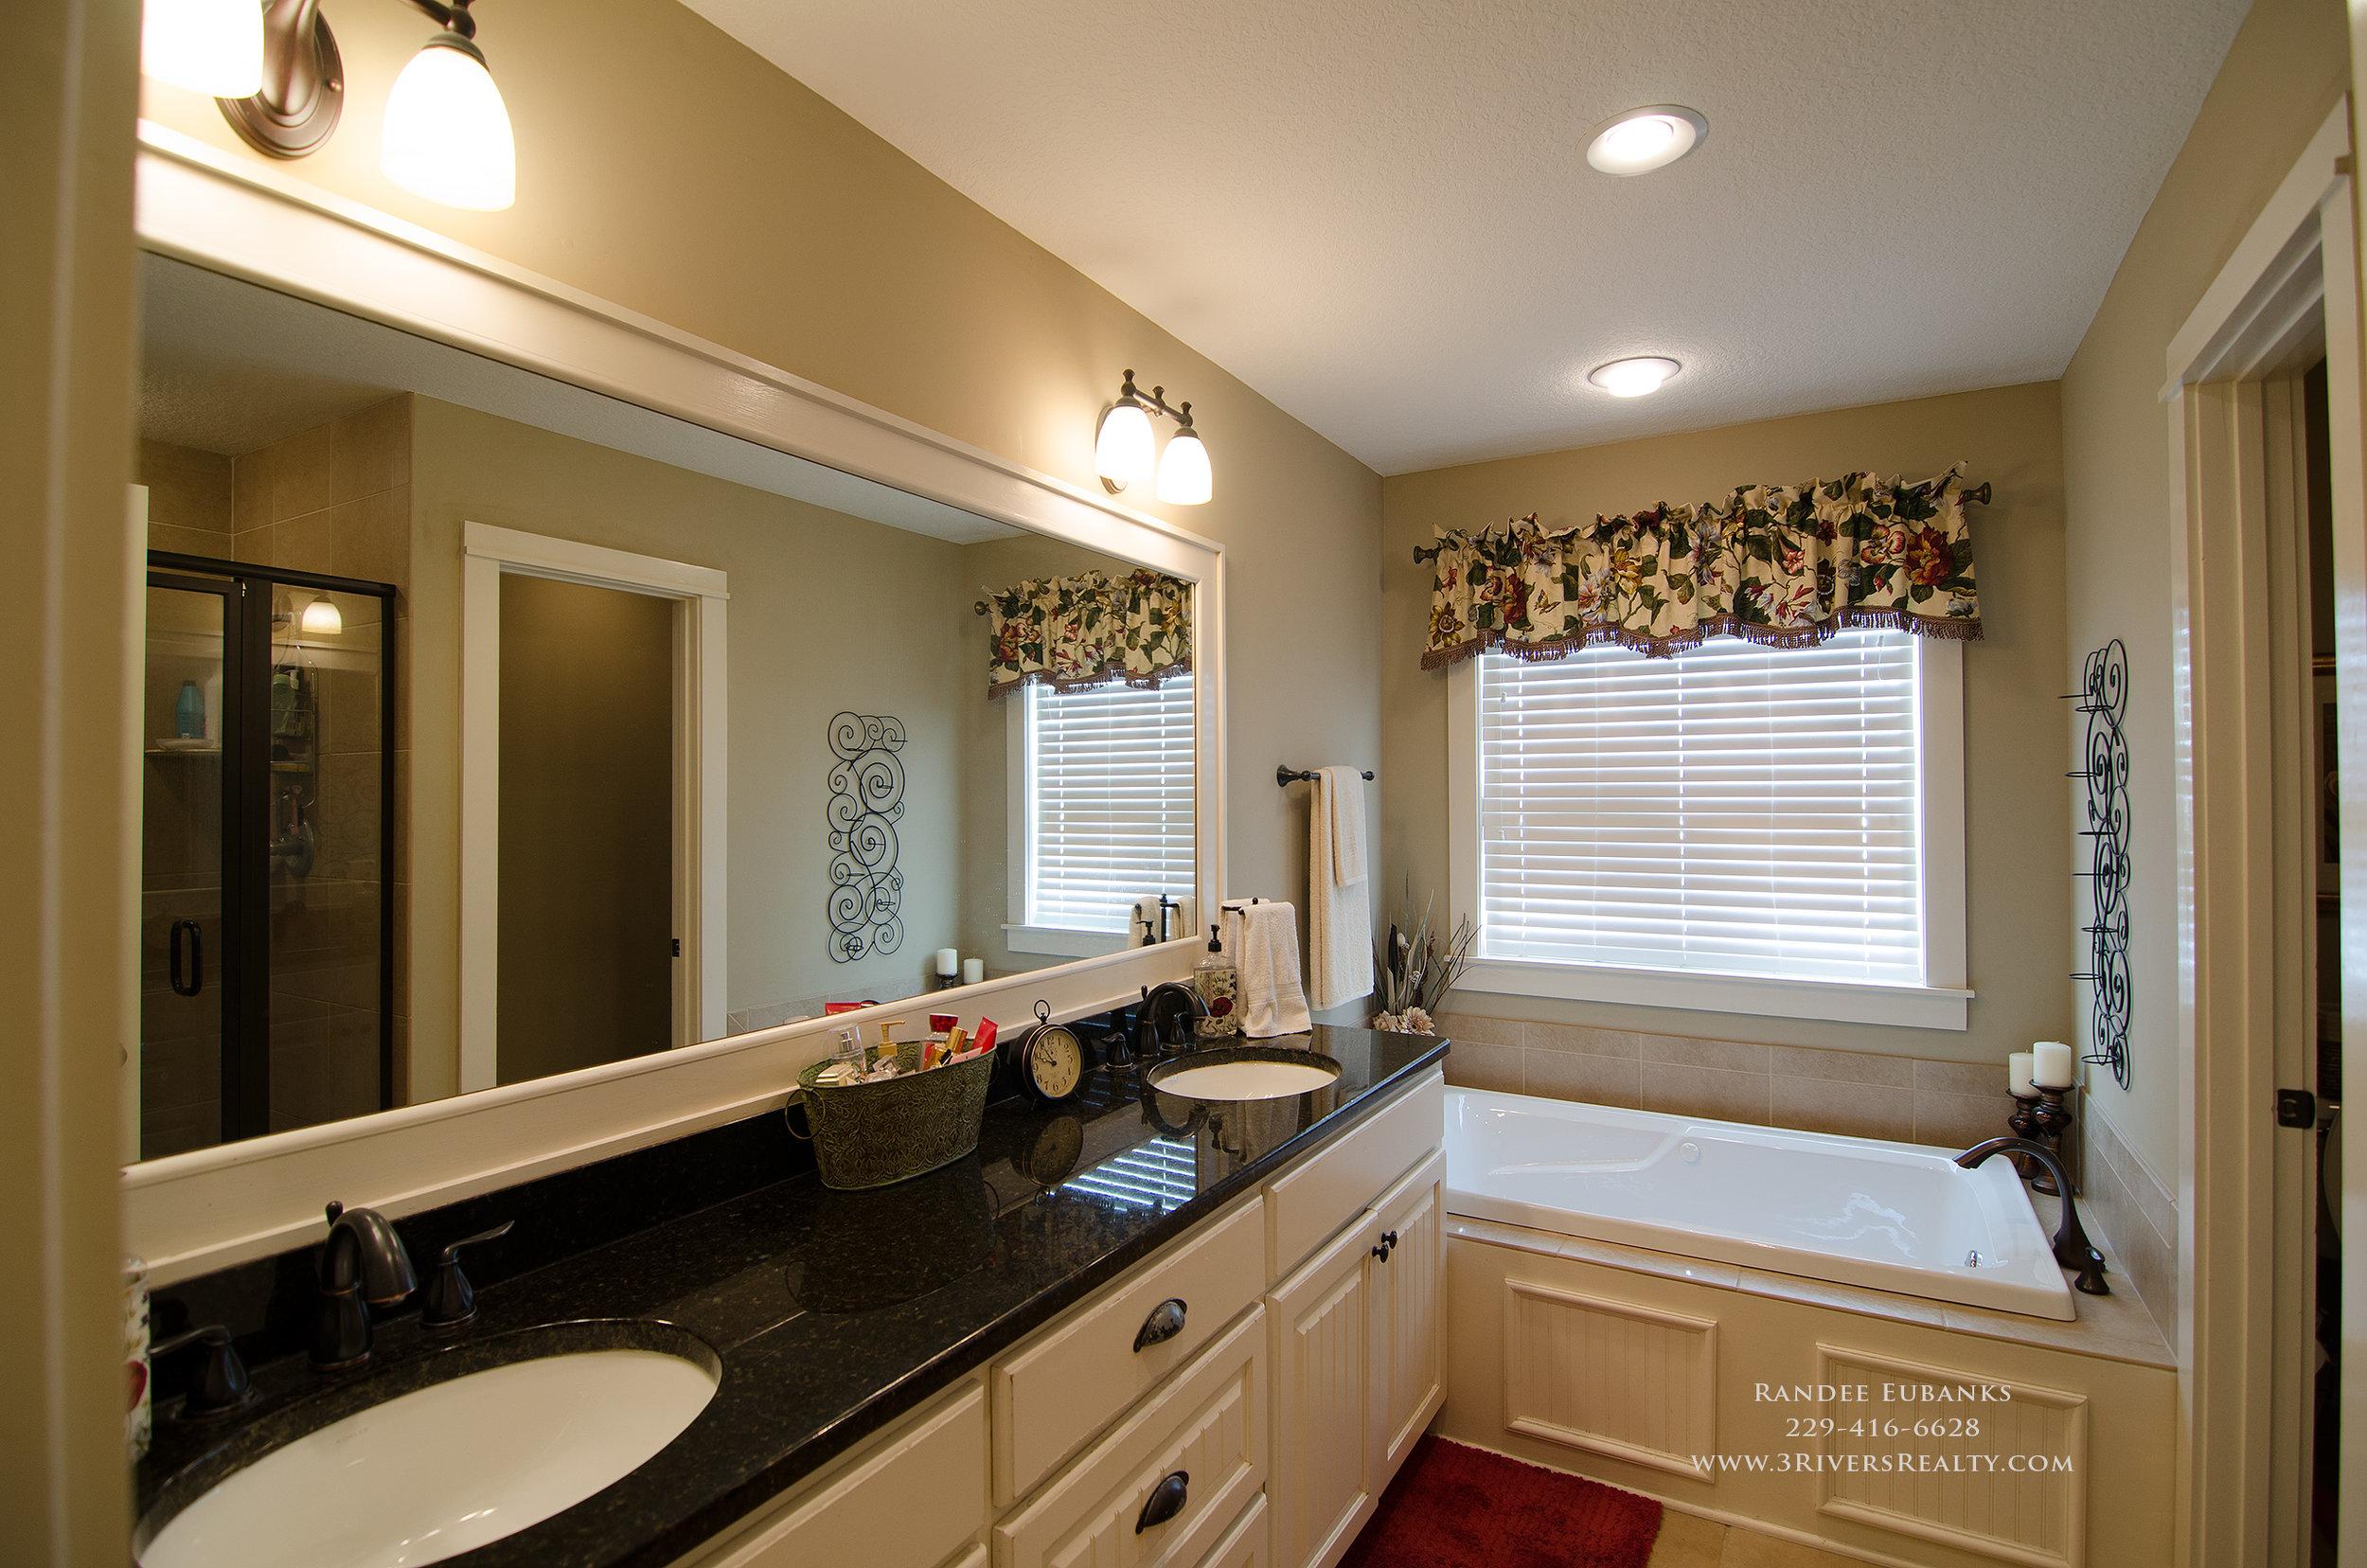 3riversrealty_bainbridge-georgia-home-for-sale_3-bed-2-bath_outdoor-fireplace_three-rivers-realty_mills-brock_Taurus-USA_-pool_back-porch-master-bath - Copy.jpg